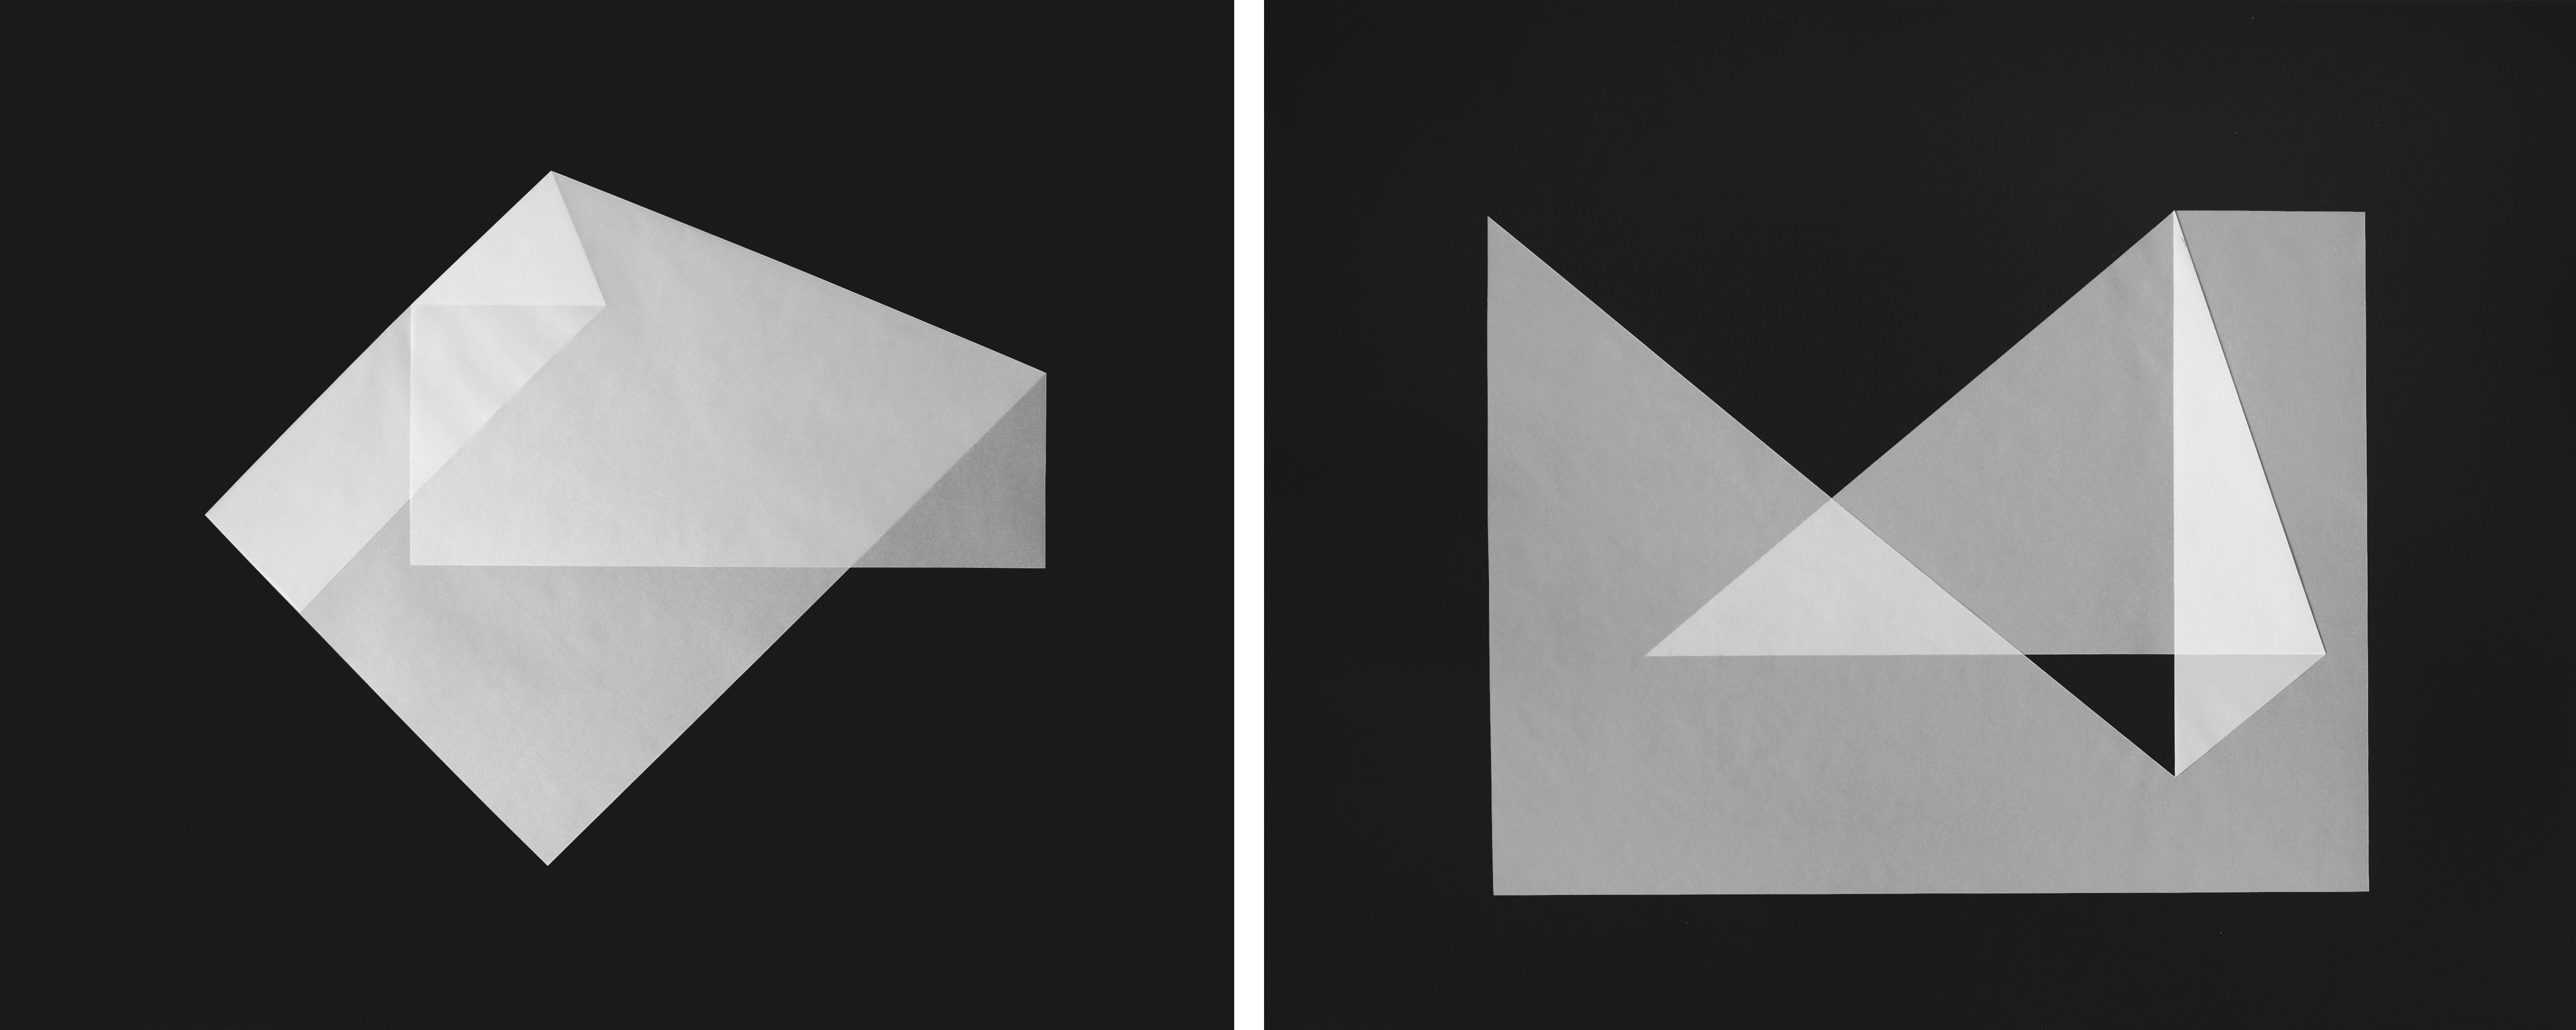 8. a/b motiv, je 50 x 60 cm, pergament gefaltet